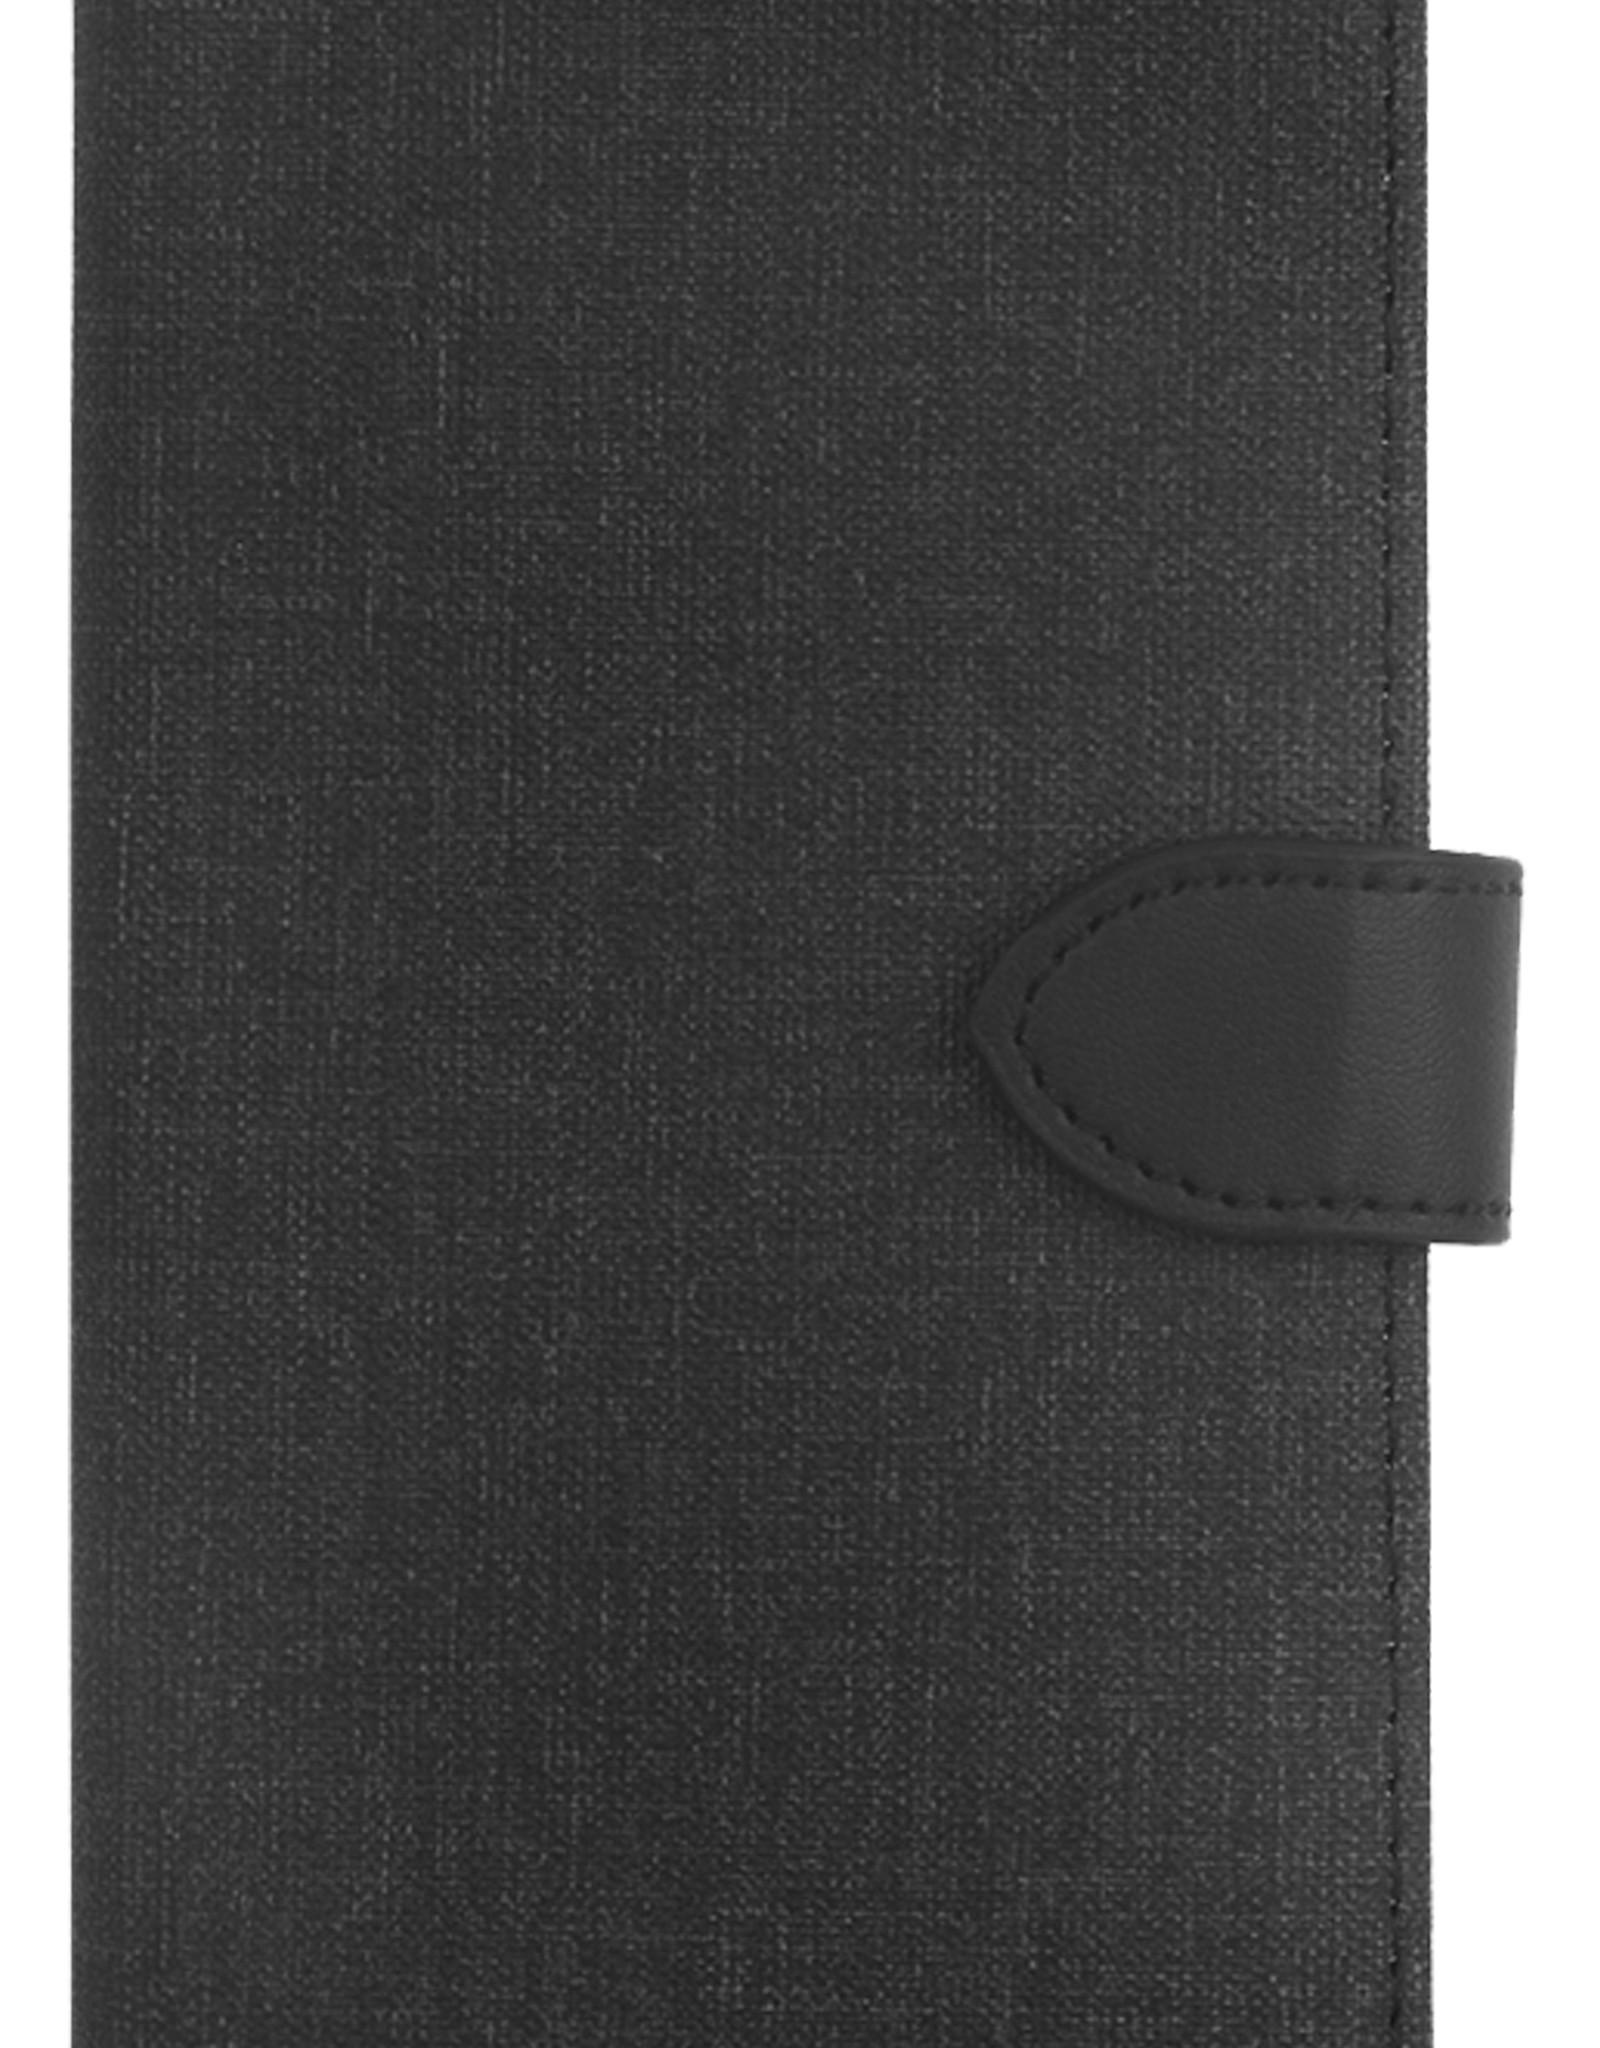 Blu Element Blu Element - 2 in 1 Folio Case Black/Black for Huawei P30 120-1662